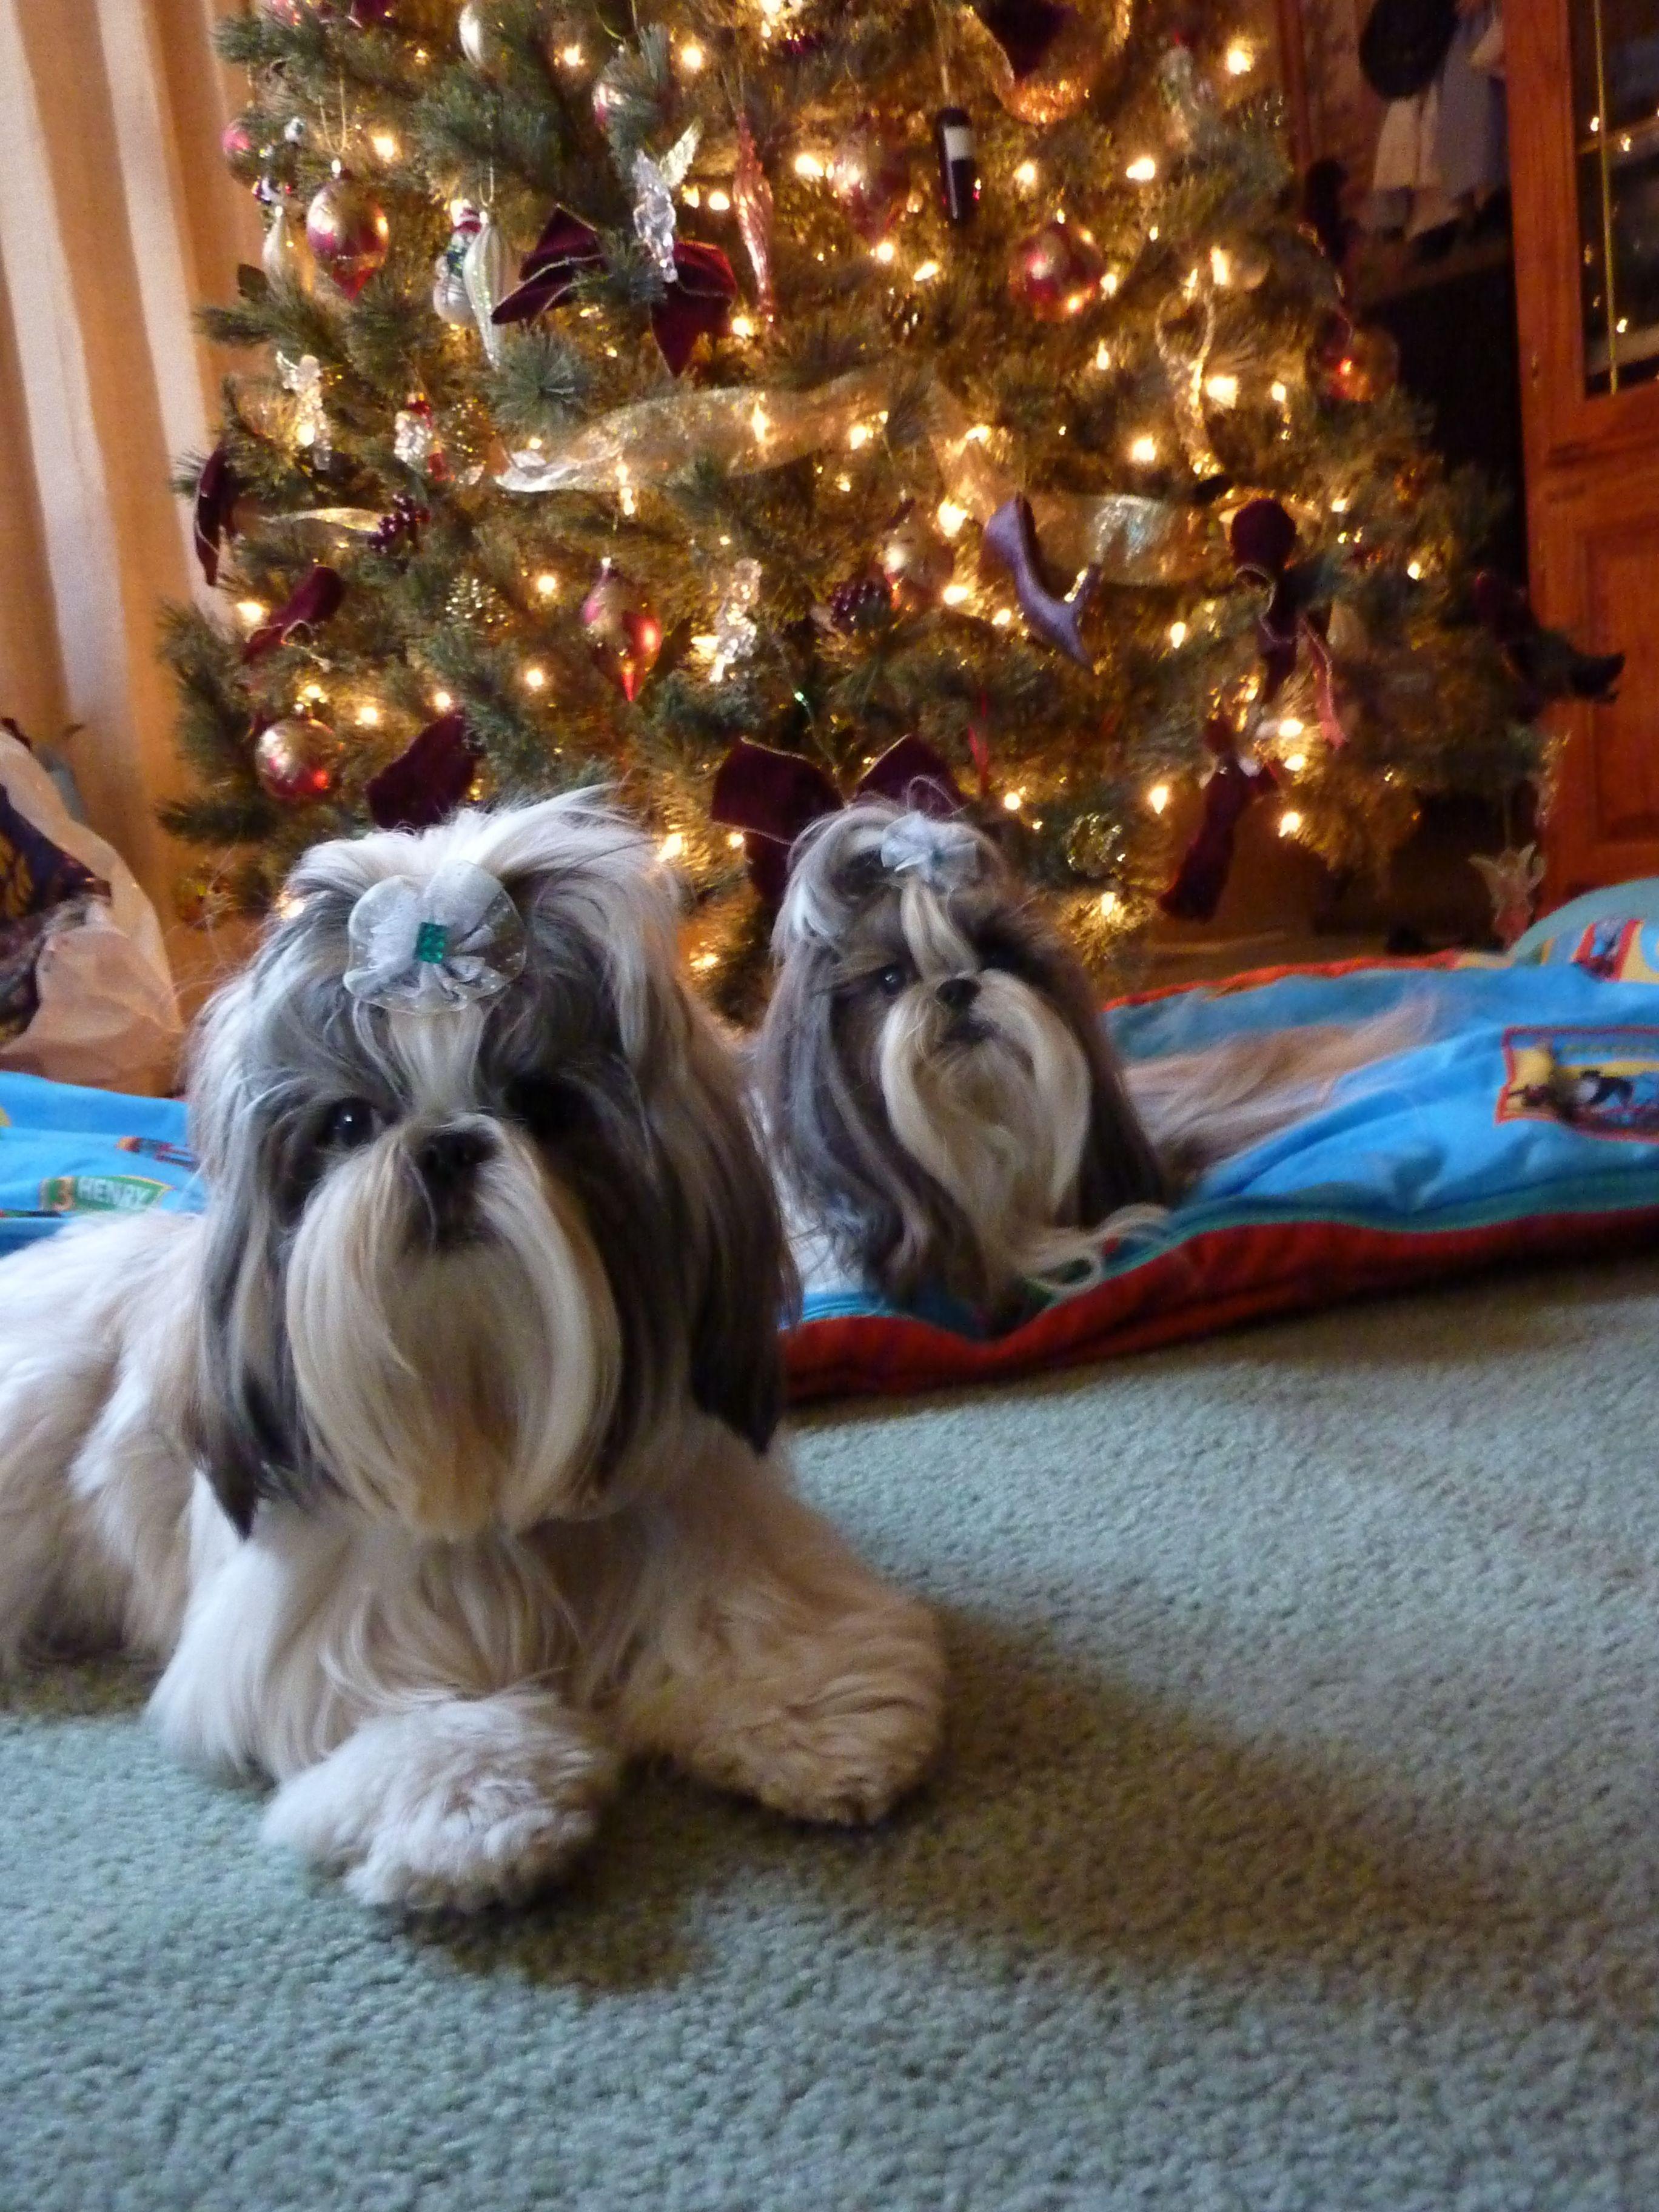 My Christmas card. HaiLi and Kabre #ShihTzu #Christmas | Shih Tzu ...